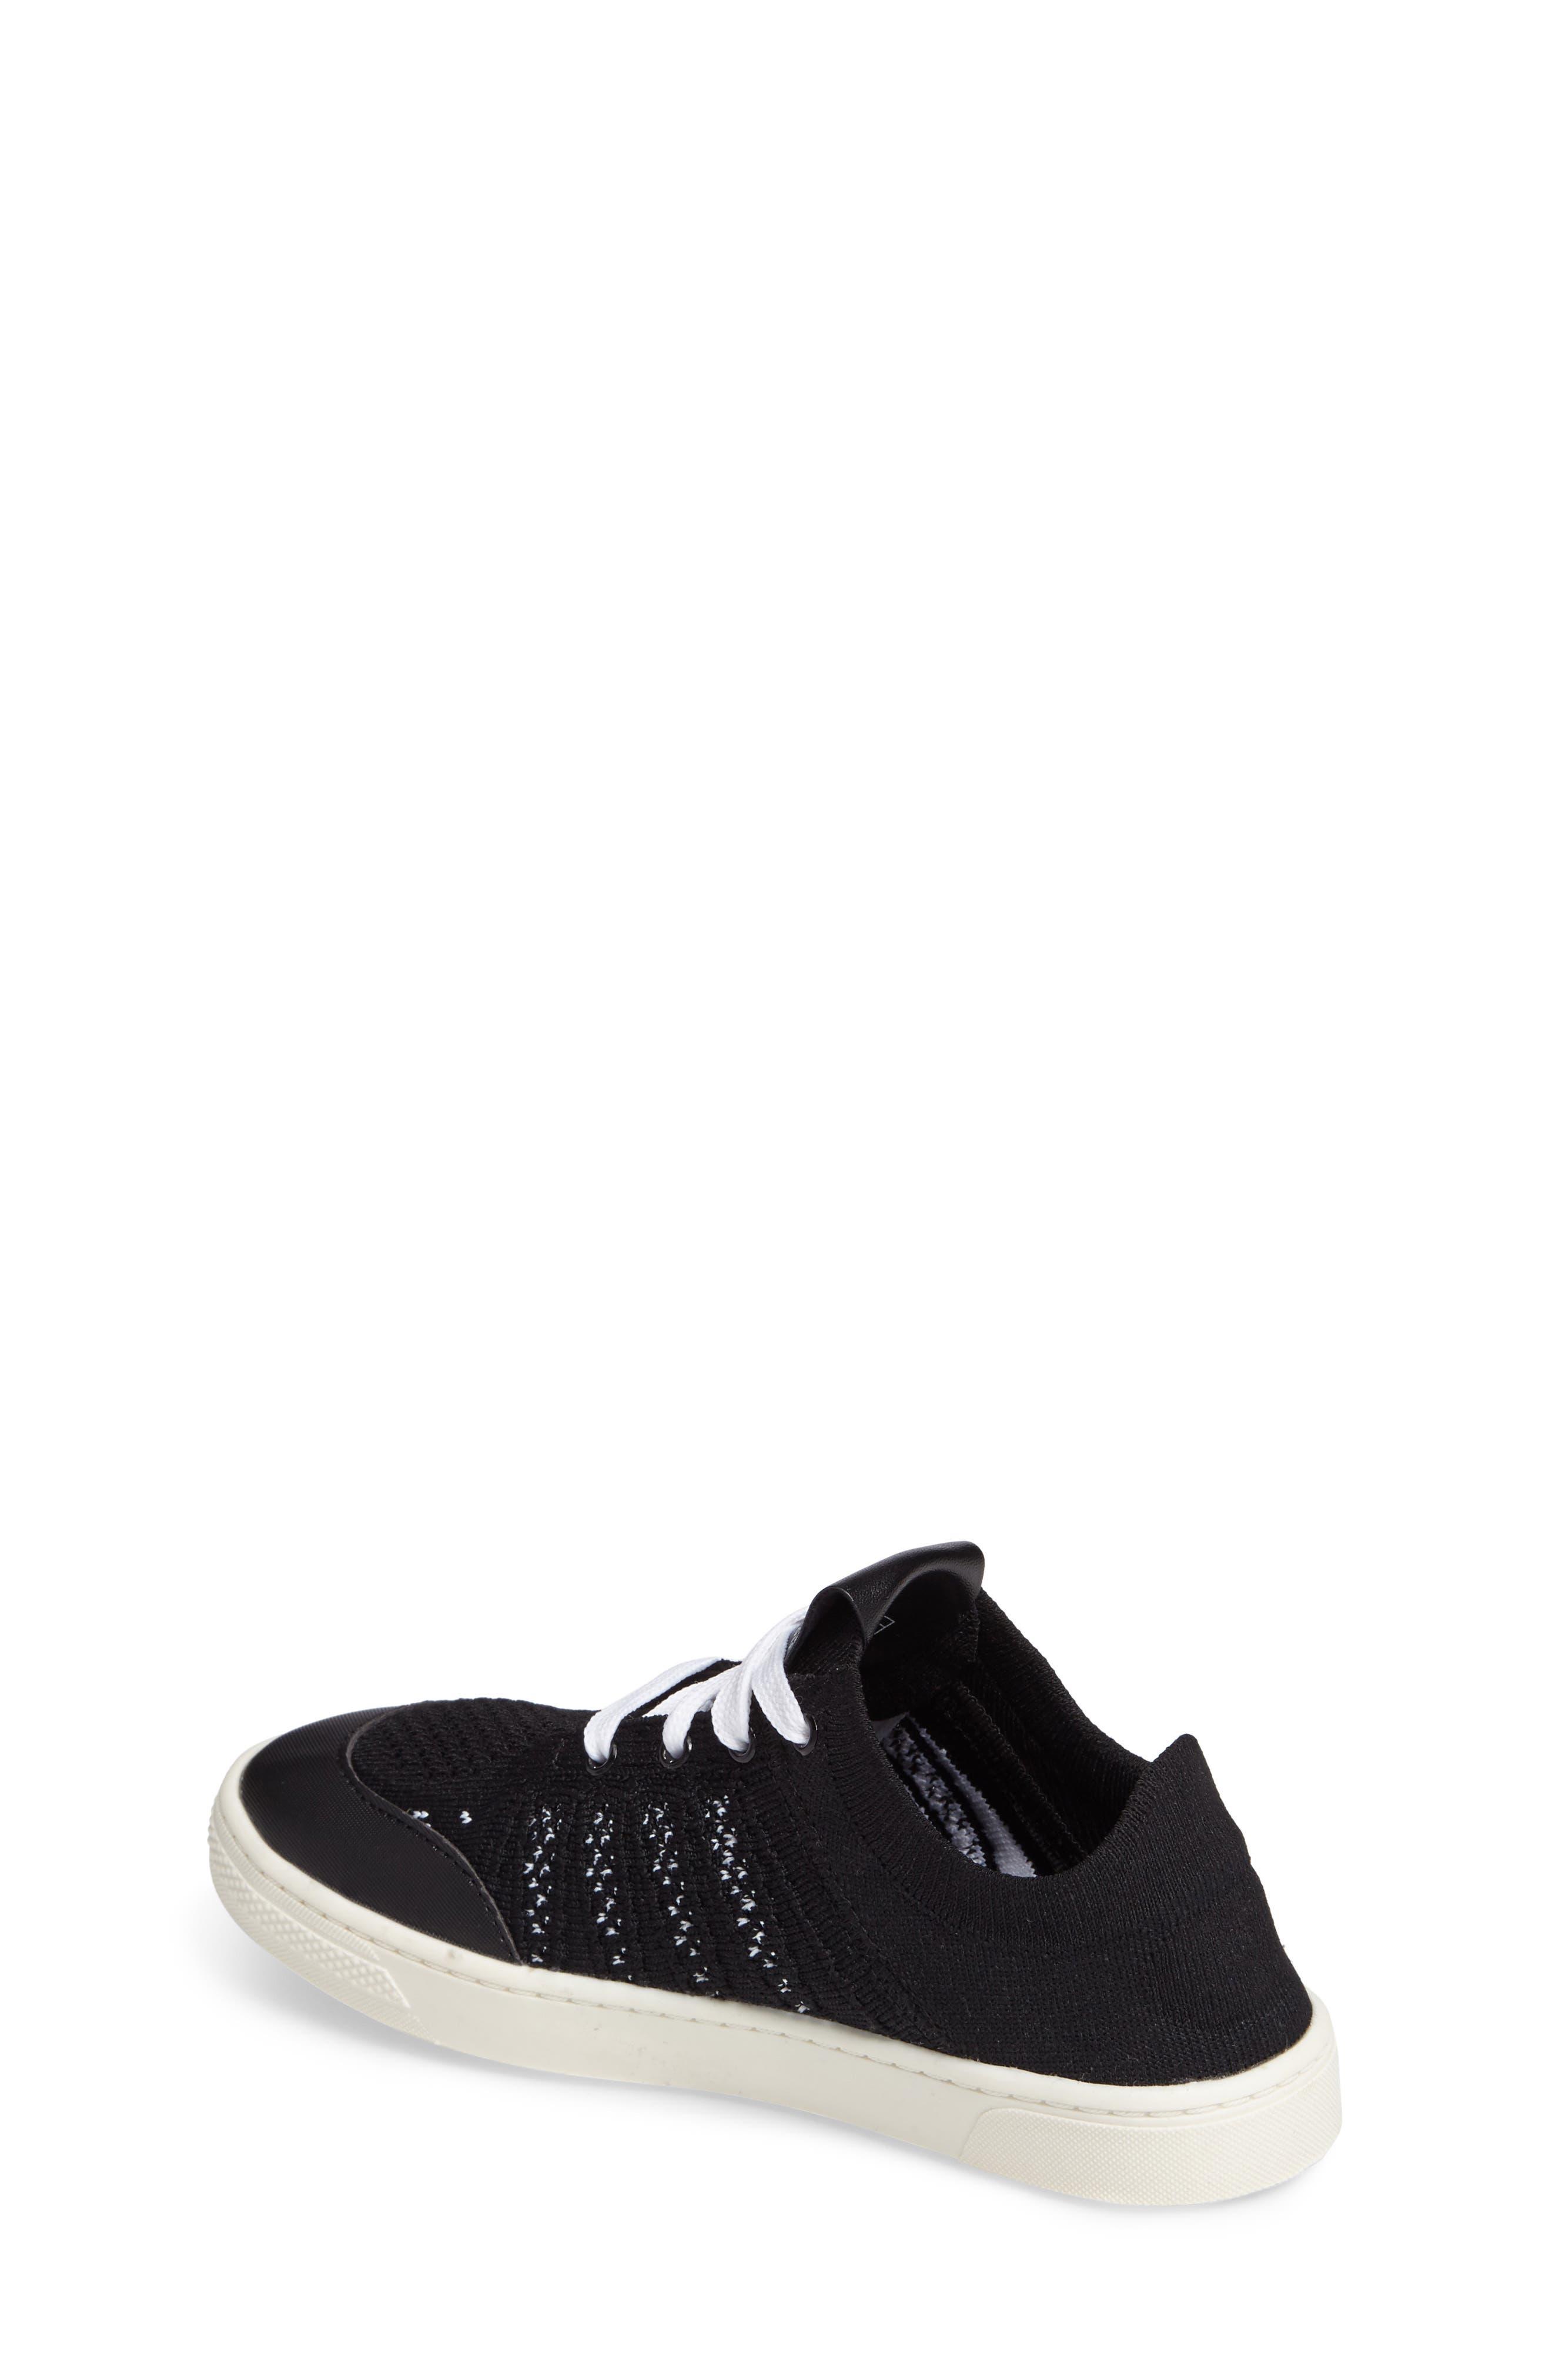 Kick Insight Woven Sneaker,                             Alternate thumbnail 2, color,                             001